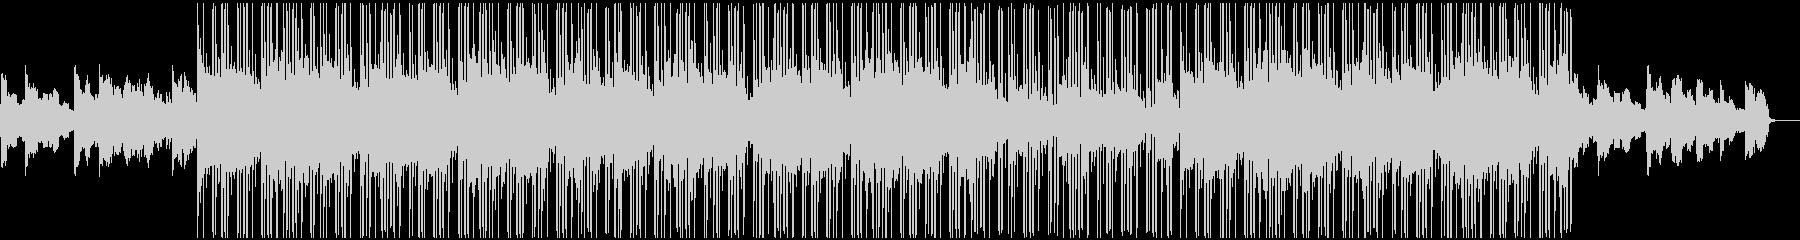 Lo-Fiのヒップホップビートの未再生の波形